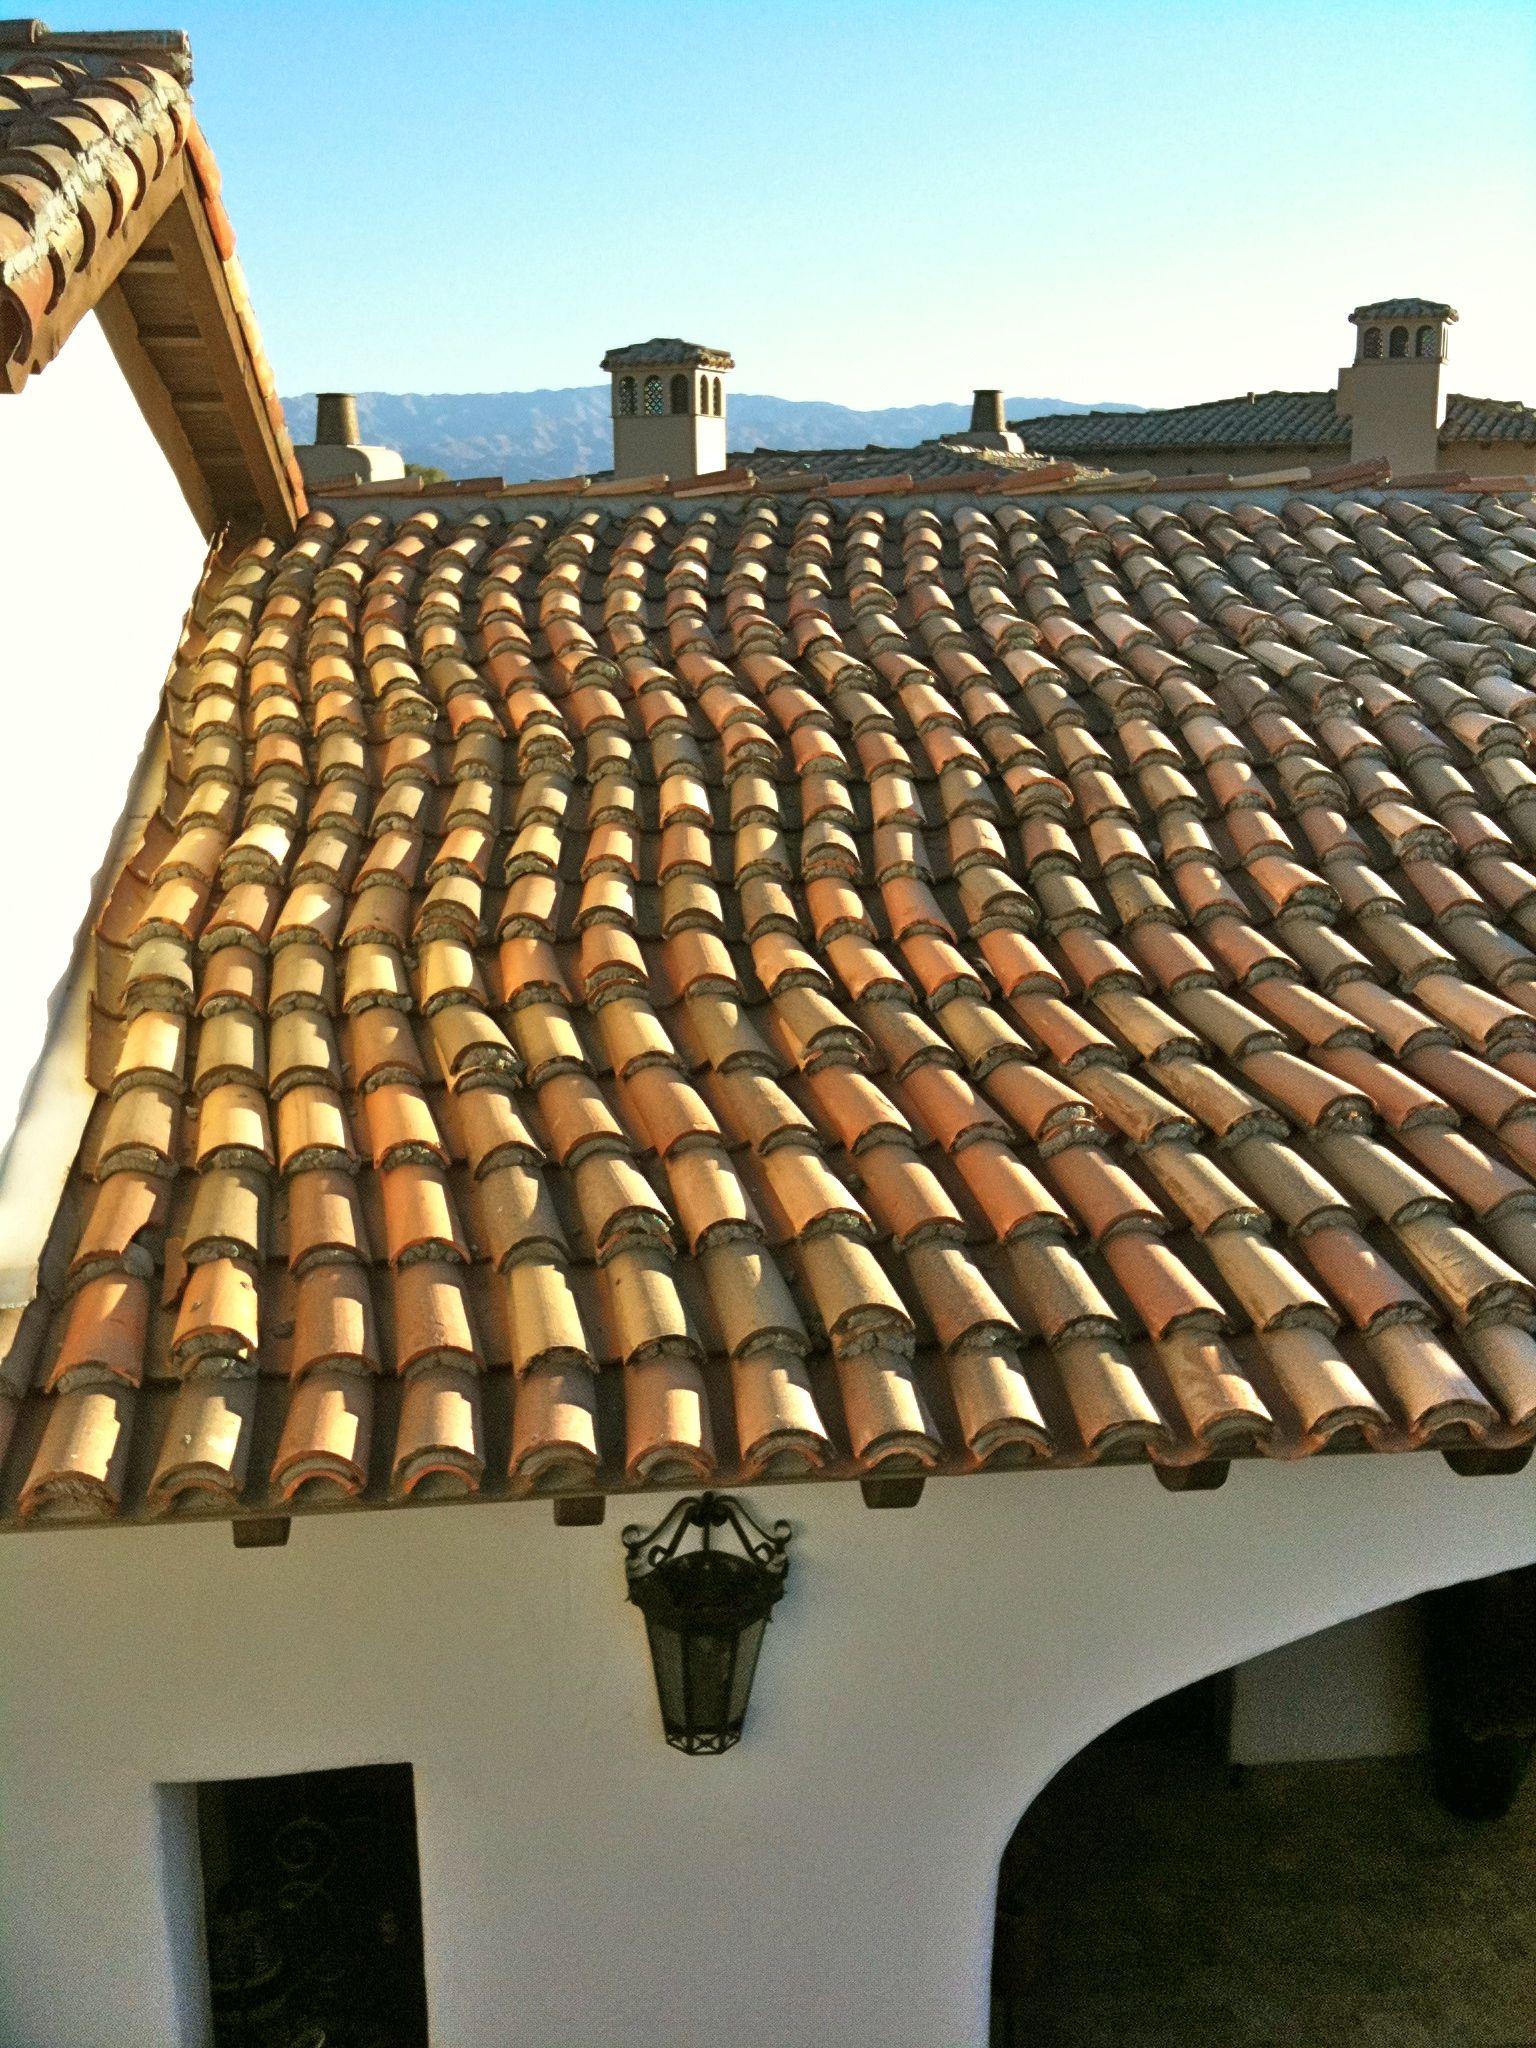 Serpentine Confetti Roof Tiles Mexican Hacienda Architecture Spanish Style Homes Hacienda Homes Mediterranean Style Homes